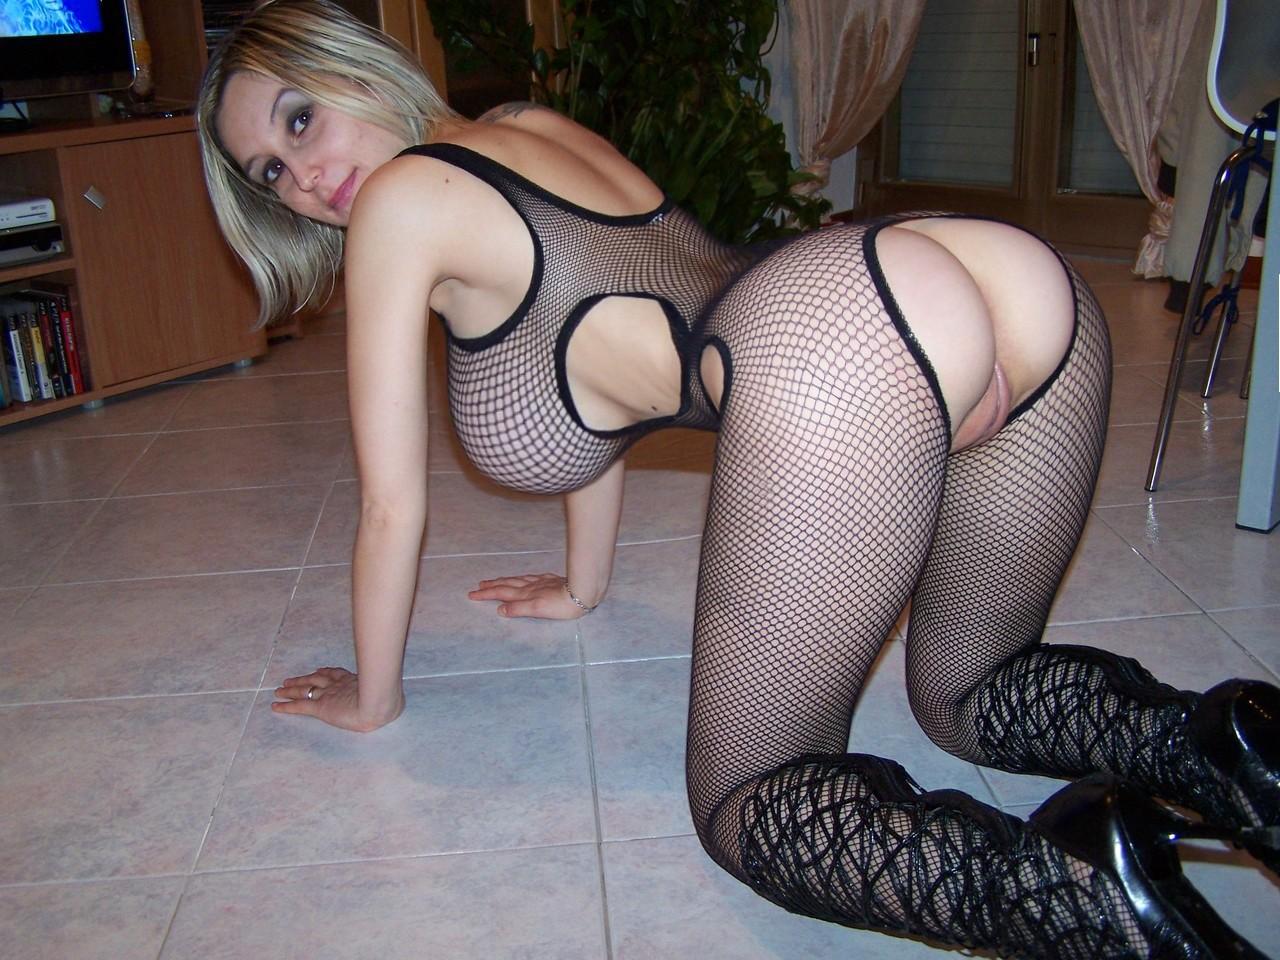 sex slave porn linni meister pupper